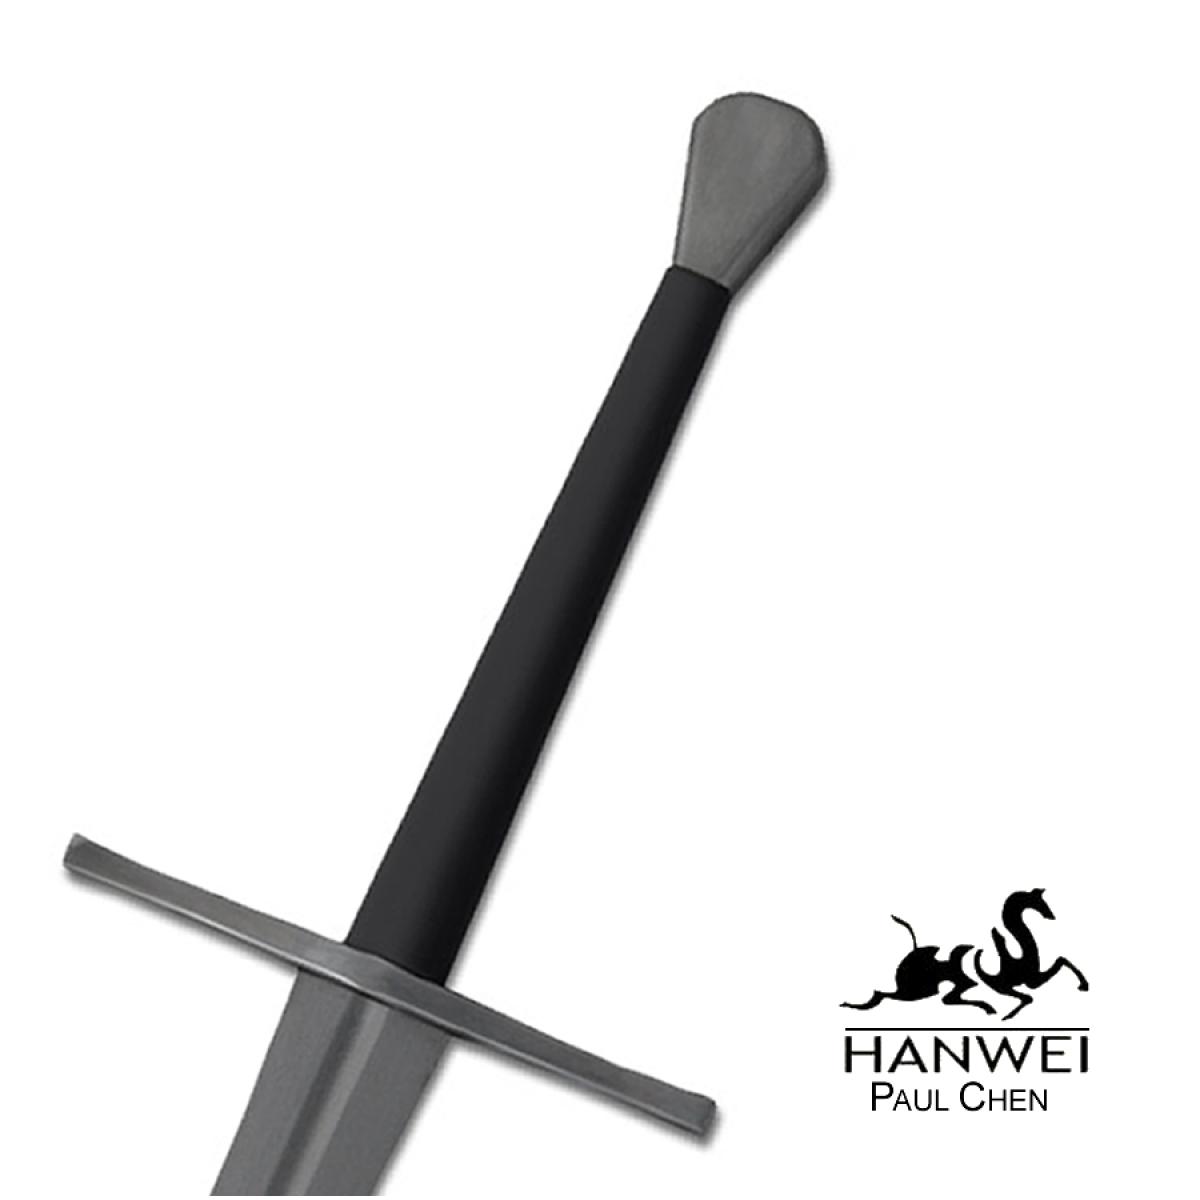 Barringtons Swords | Hanwei Paul Chen Medieval Tinker Longsword (Sharp)